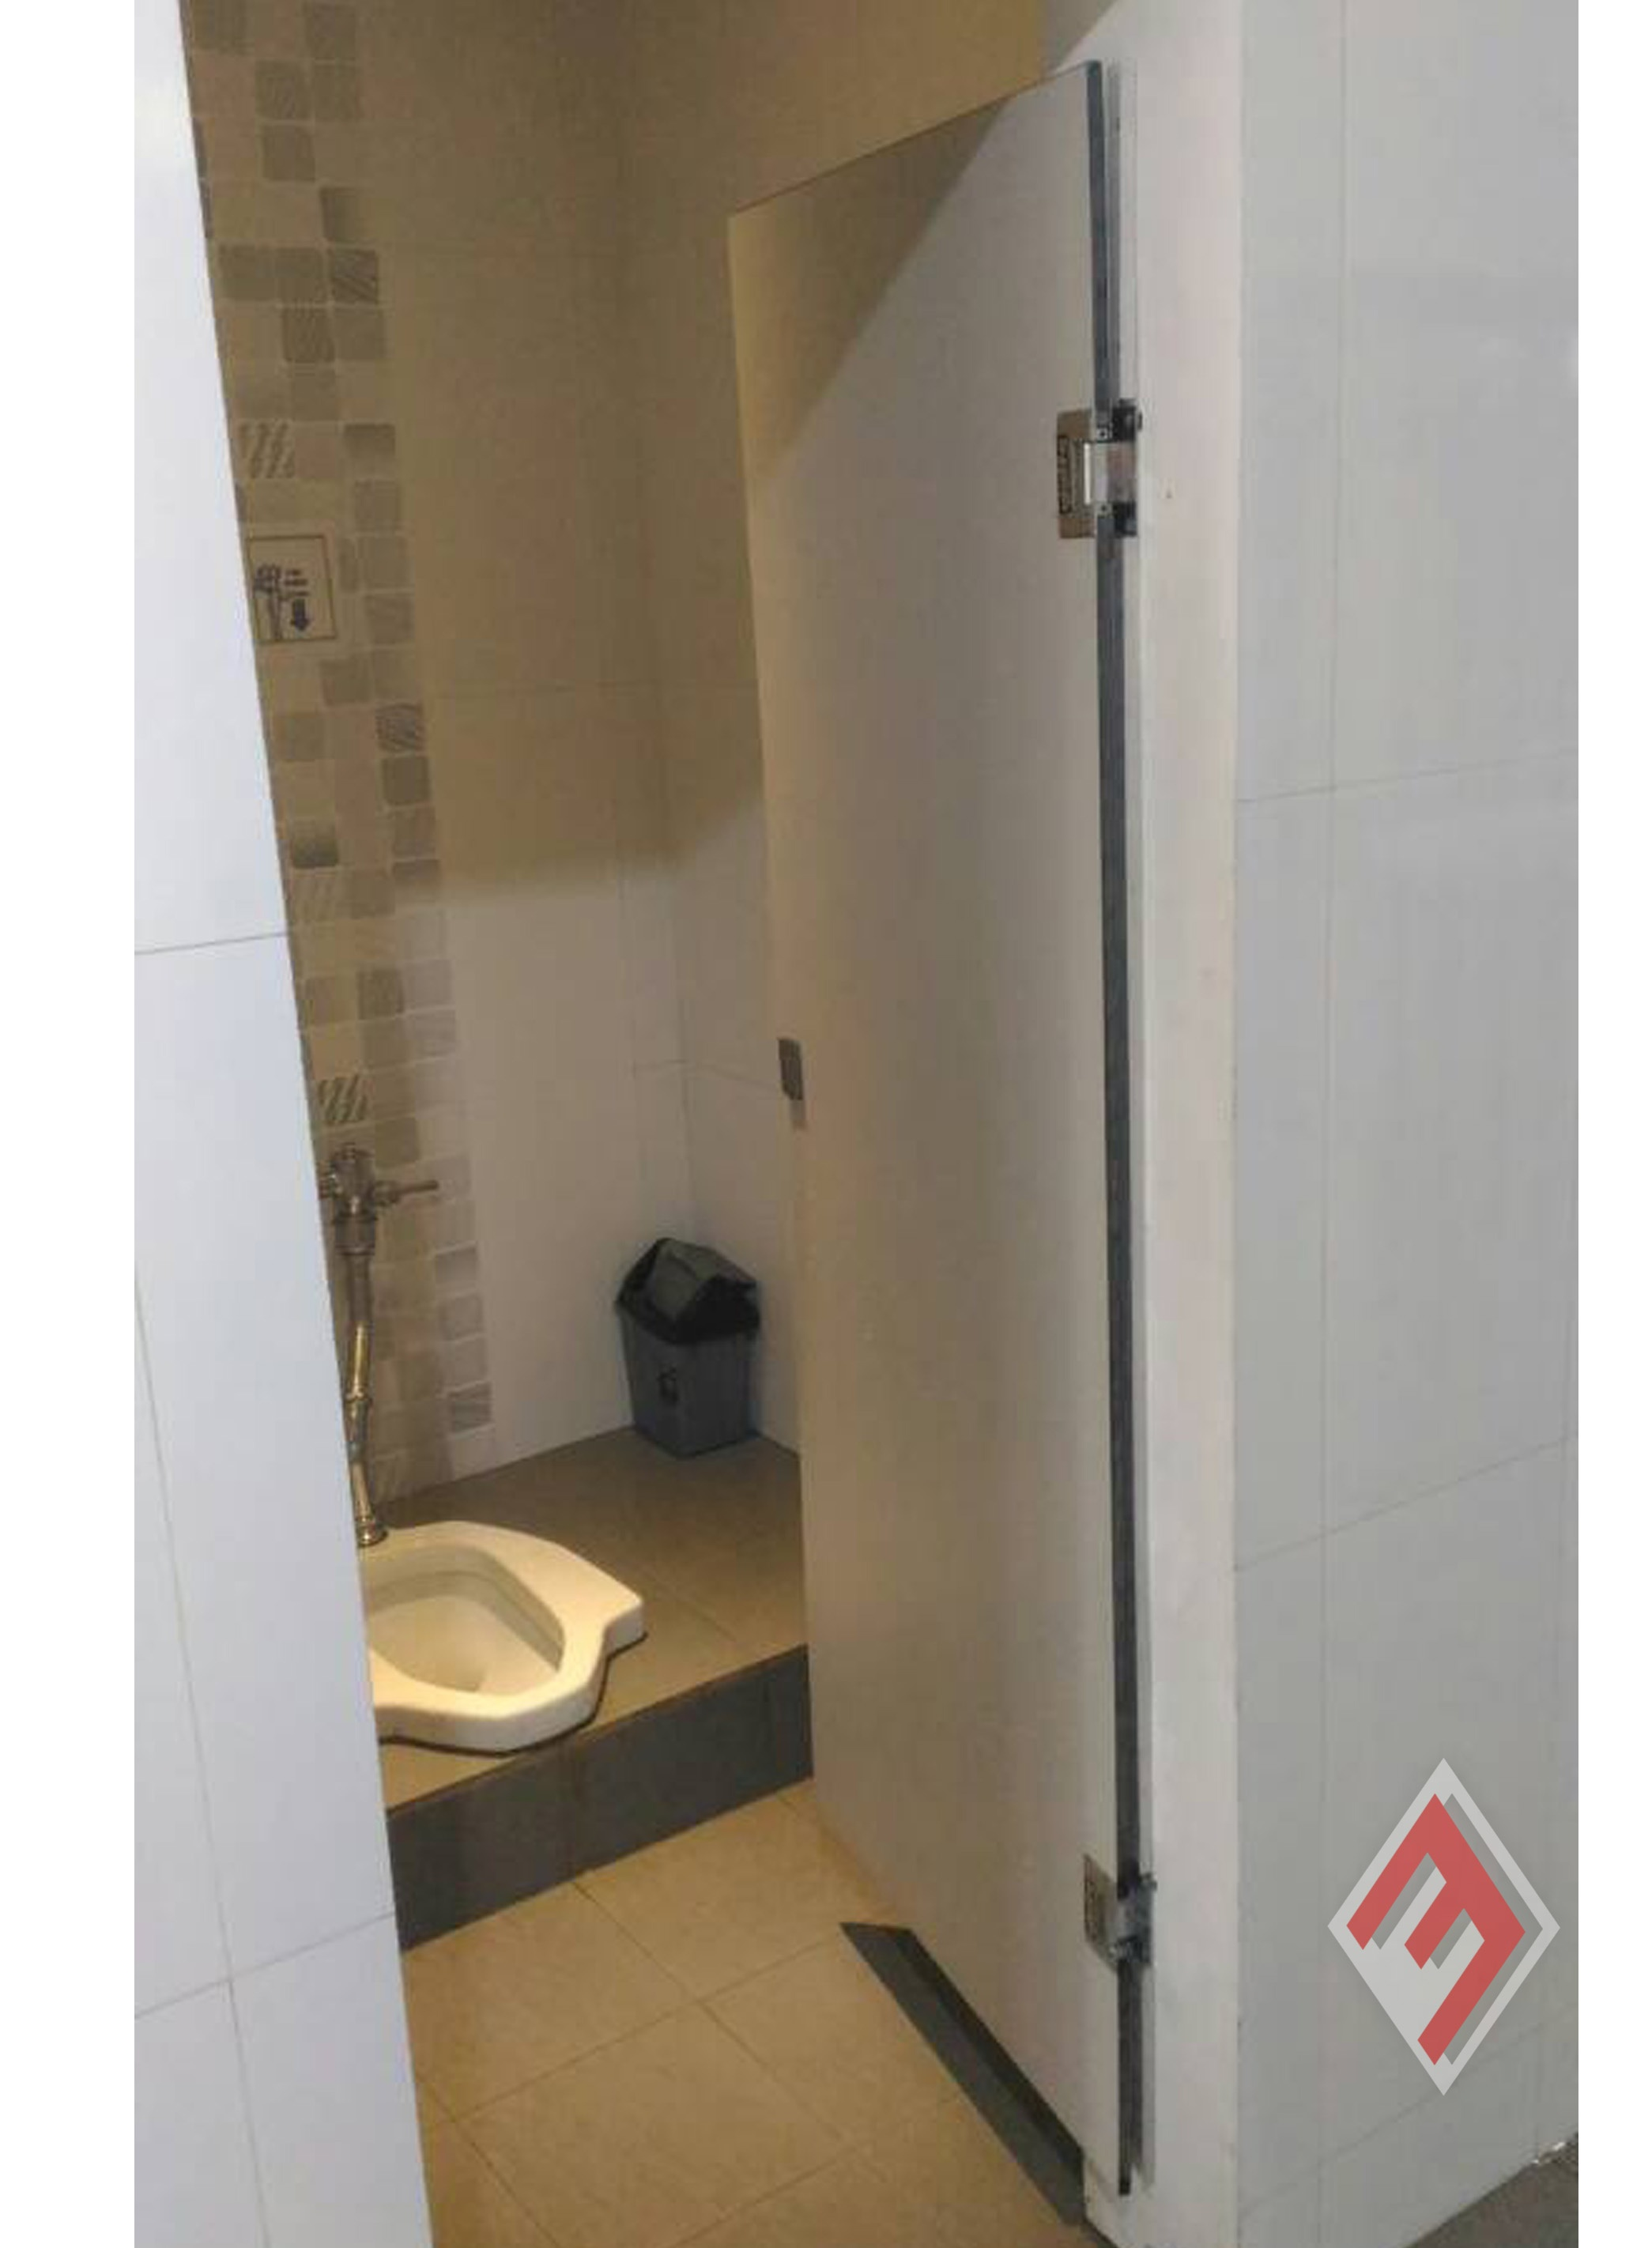 Aplikator Cubicle Toilet Indonesia PEMASANGAN PINTU TOILET/KAMAR MANDI